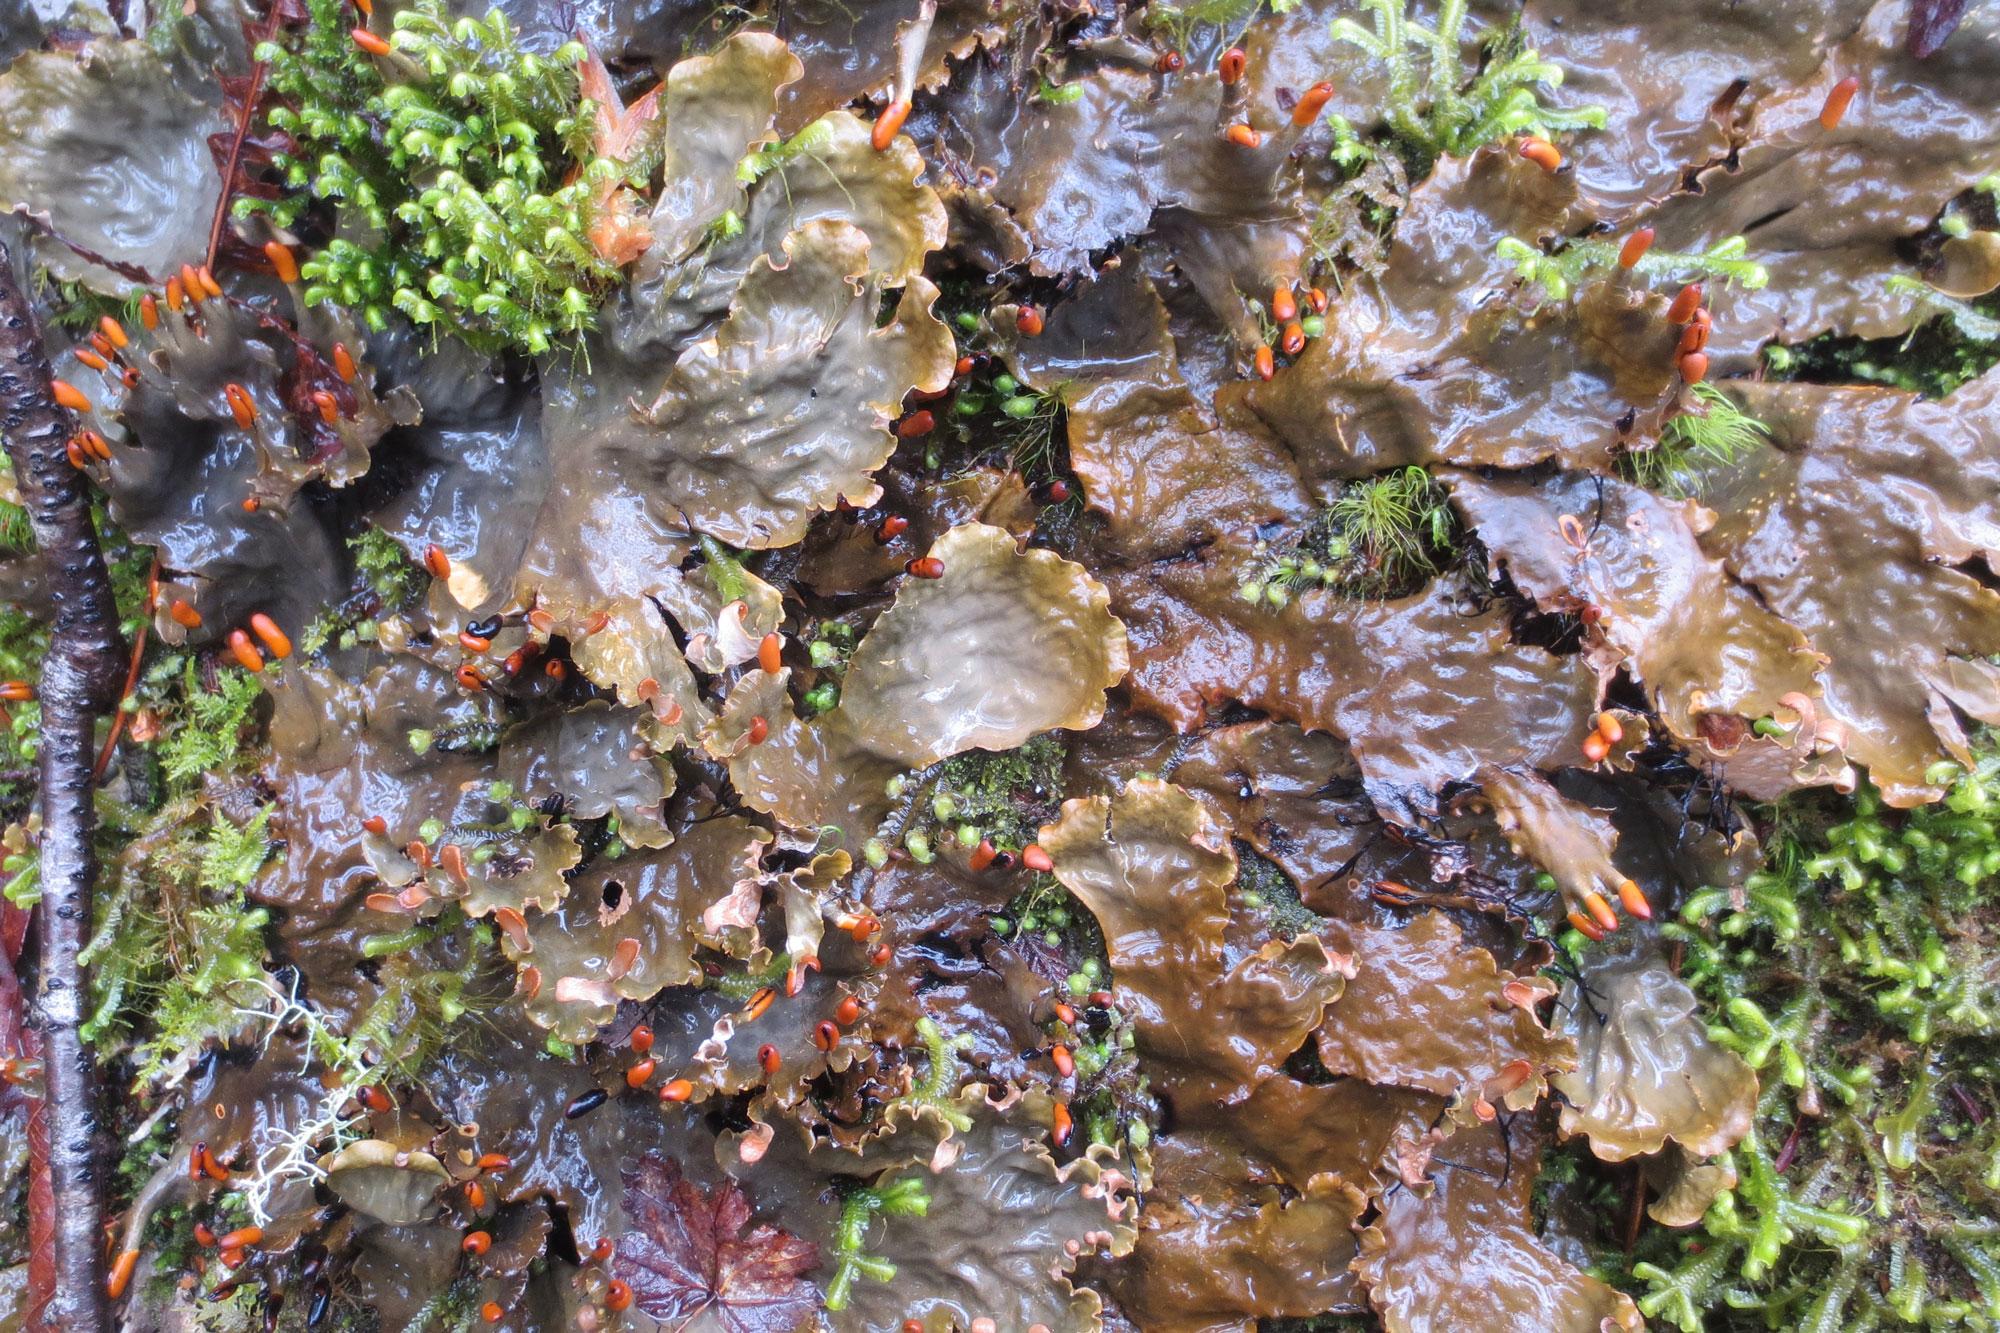 Close-up photograph of lichen